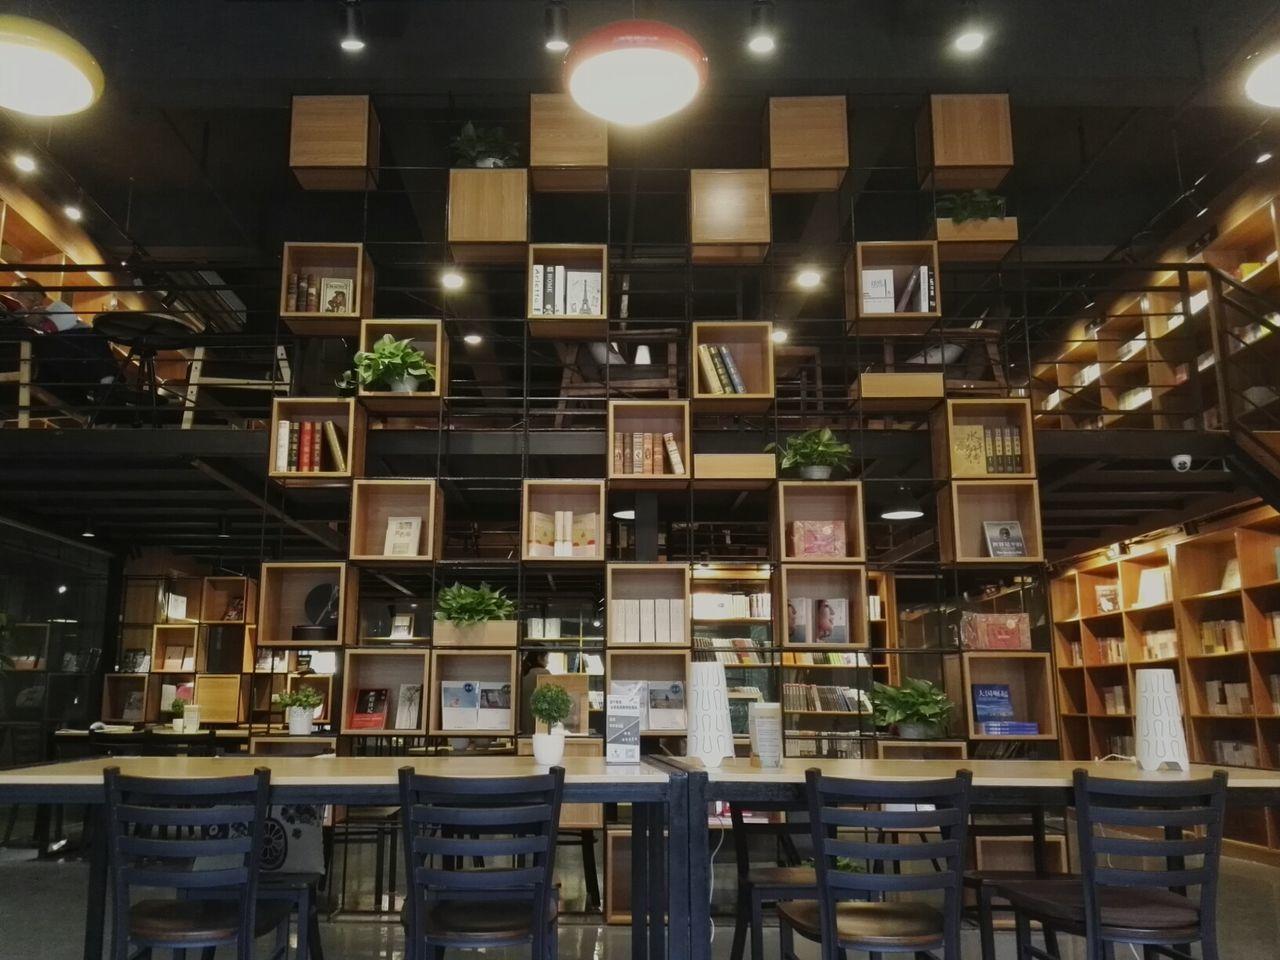 illuminated, indoors, no people, shelf, choice, night, bookshelf